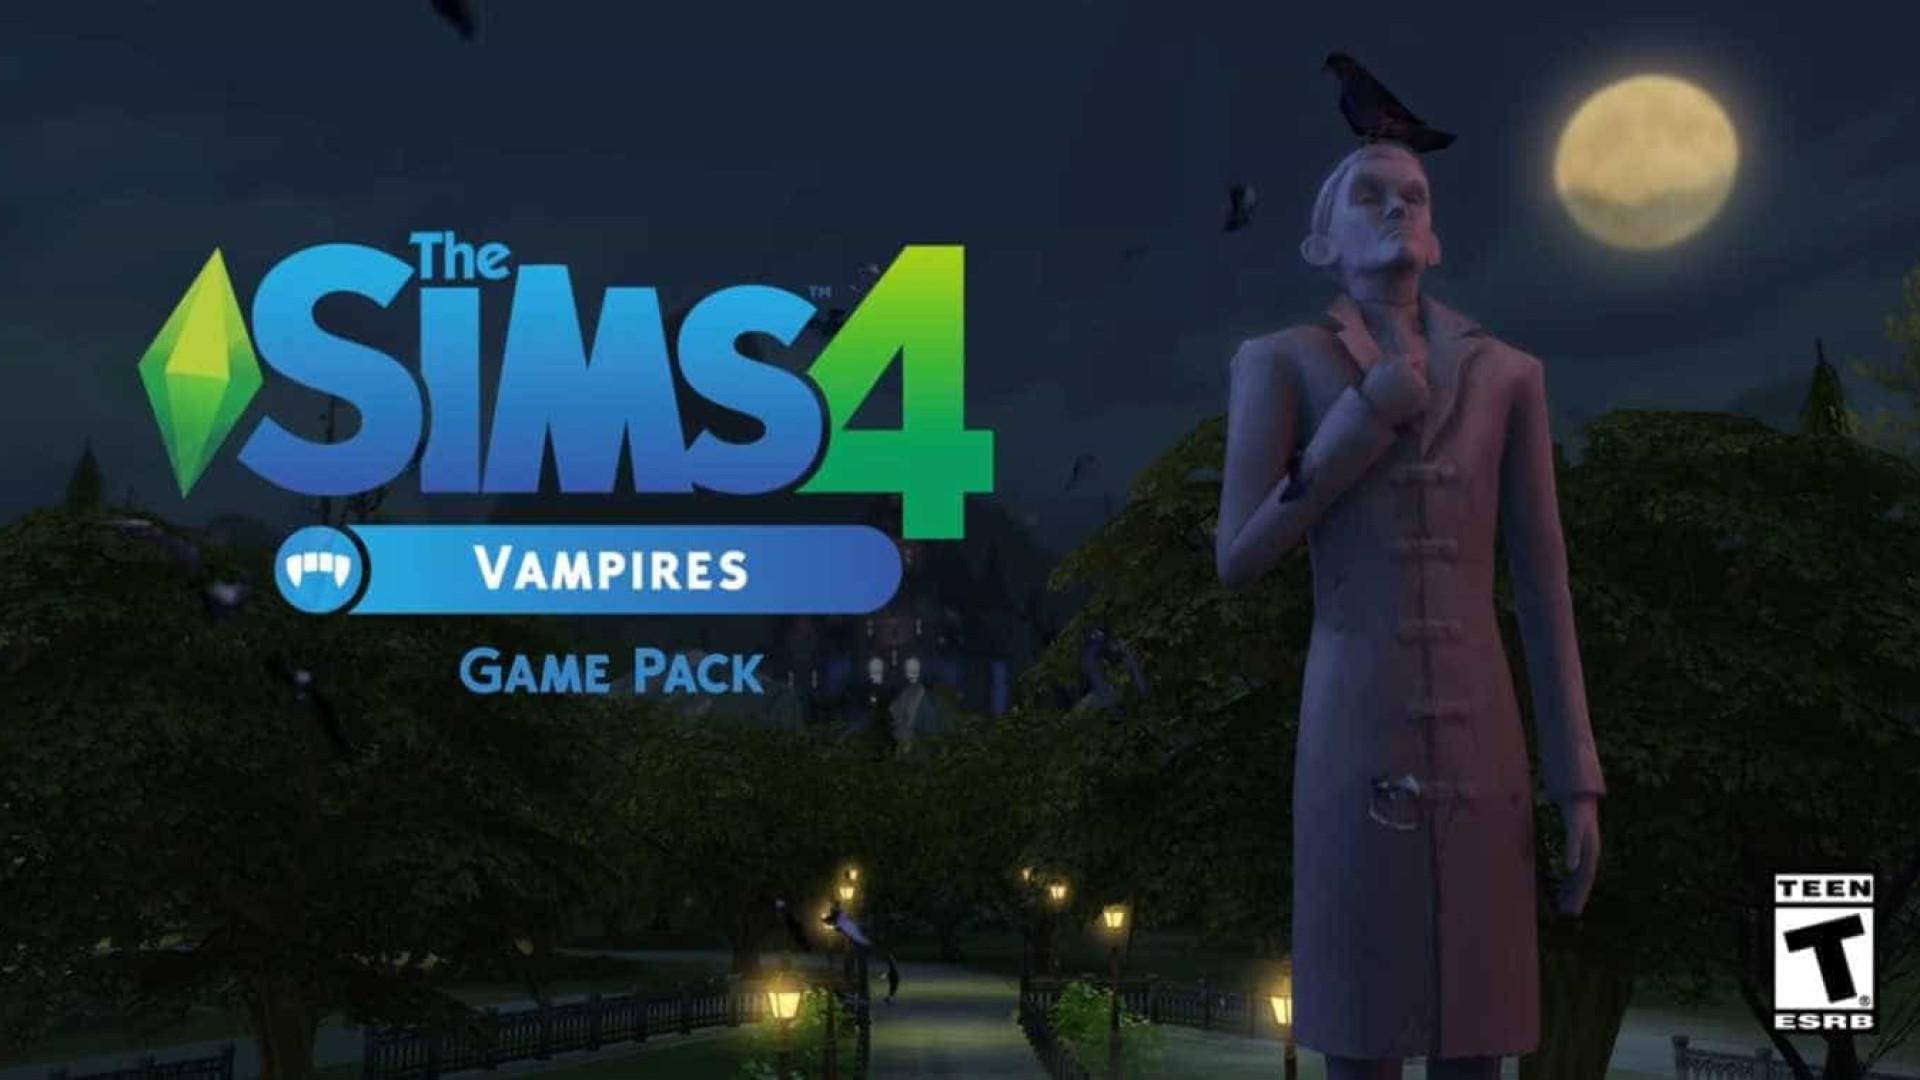 Vai ser mais fácil manter vivos os seus Sims. Prepare-se para vampiros